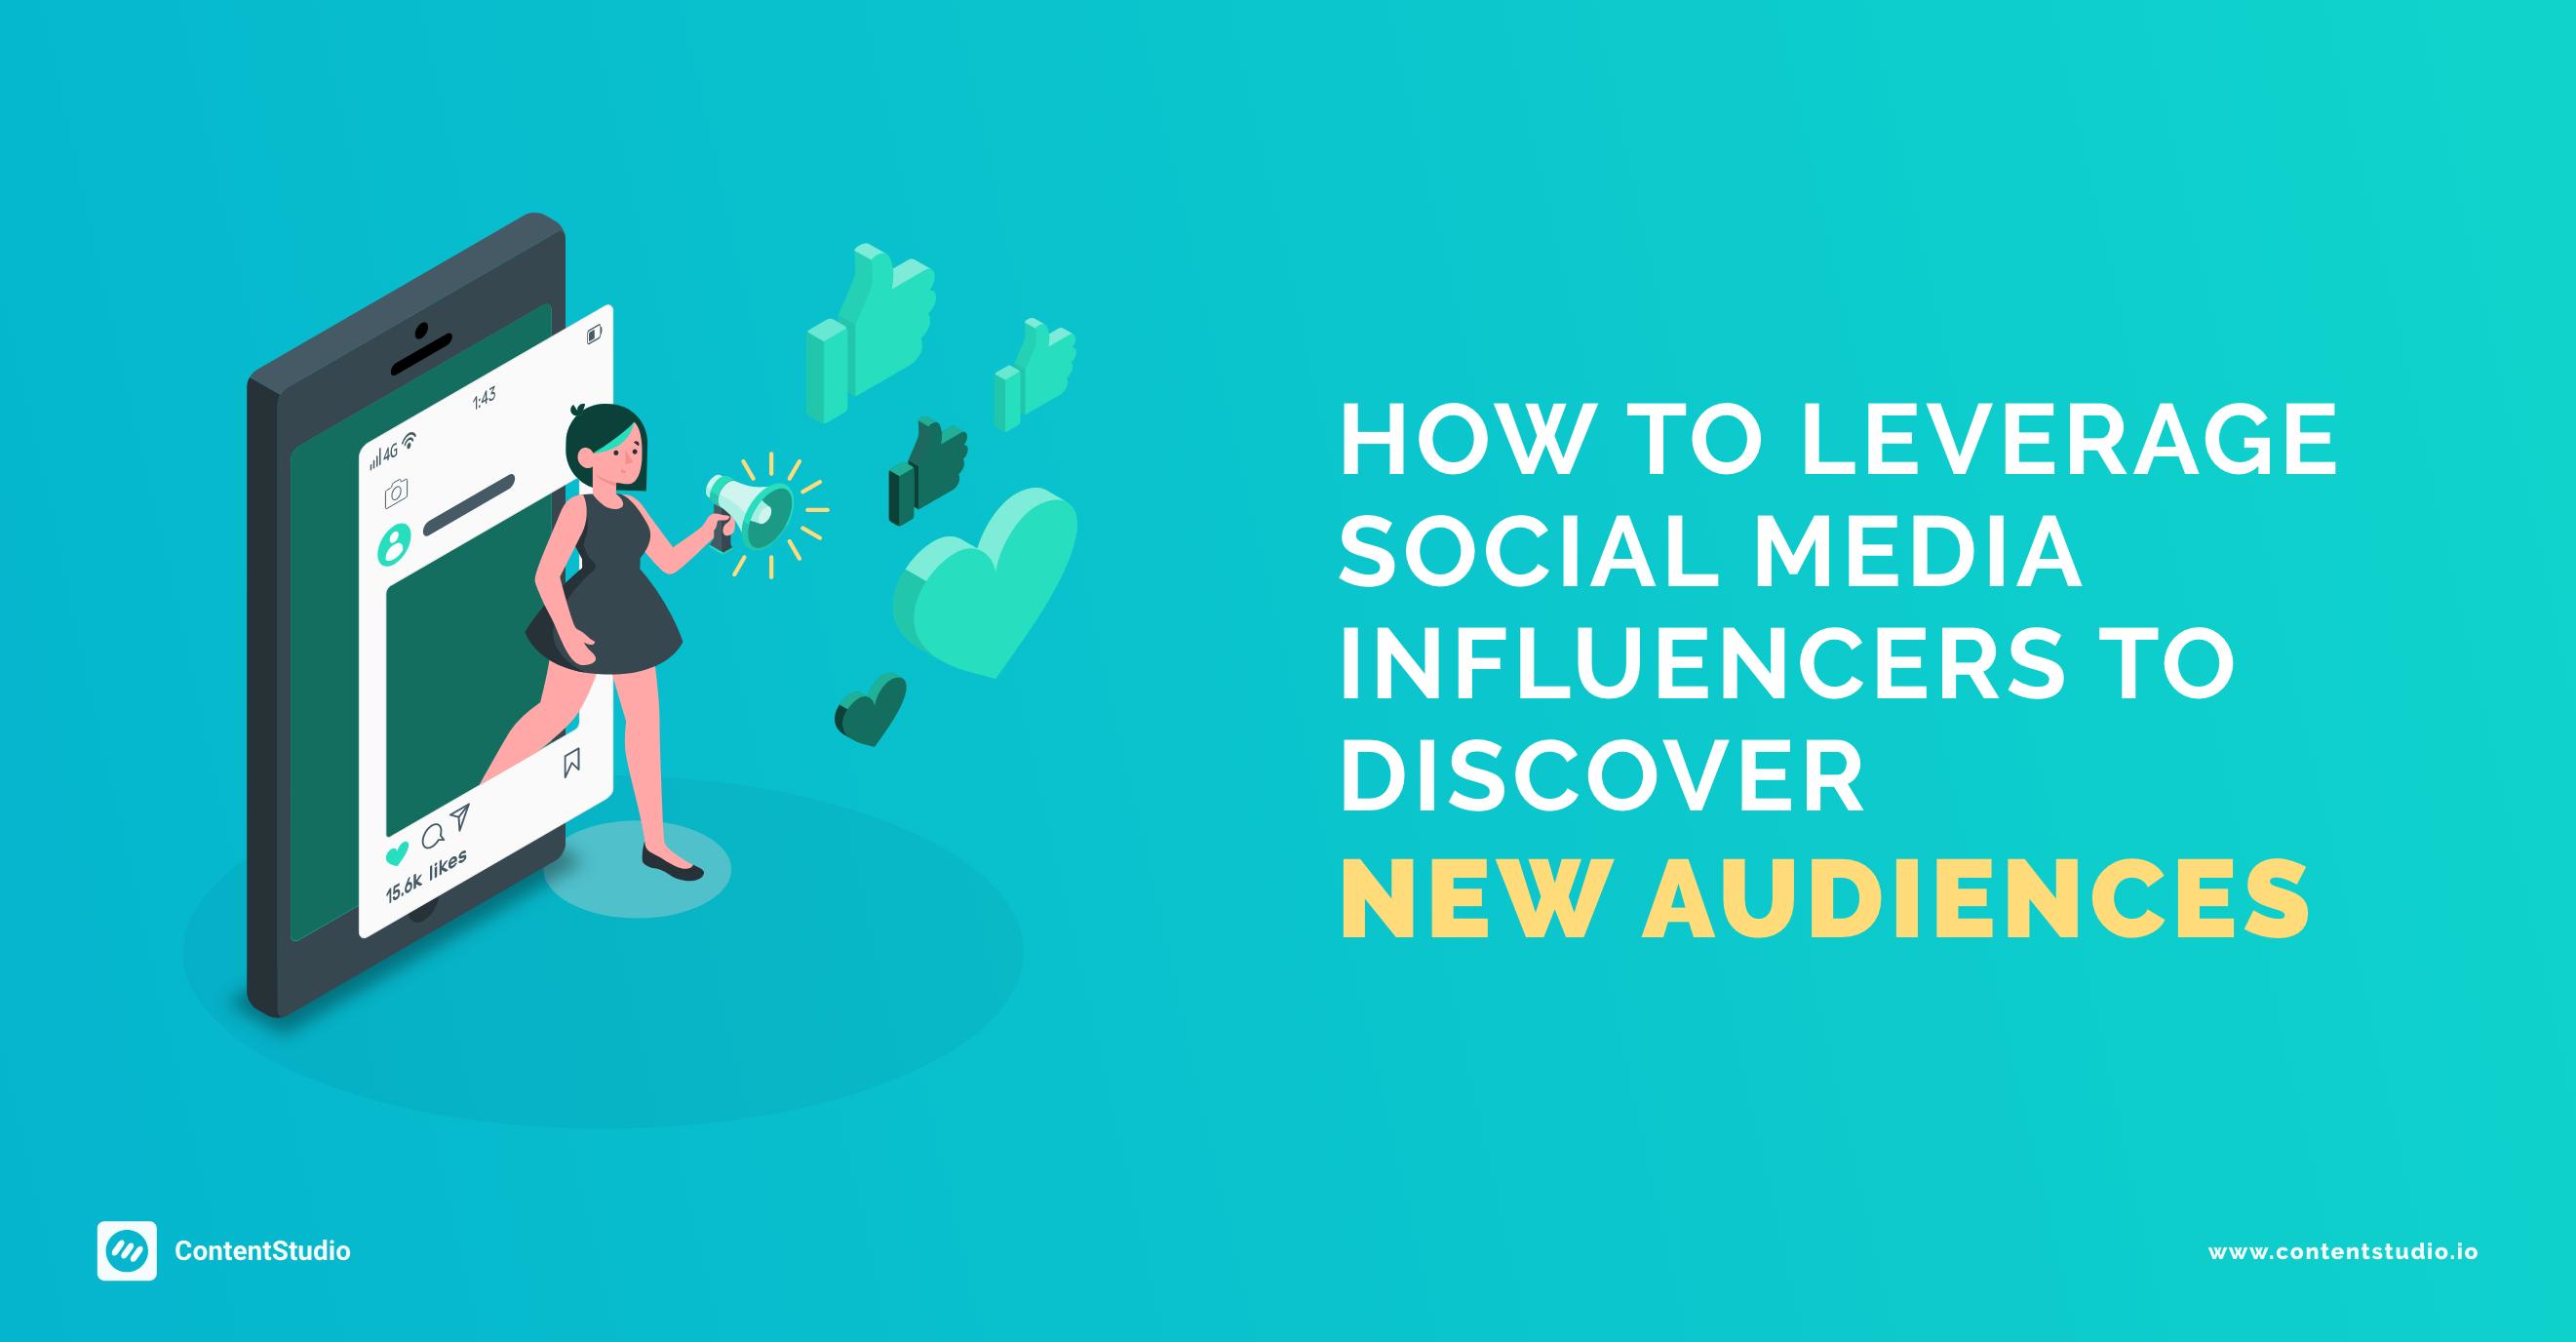 Influencer Marketing - ContentStudio